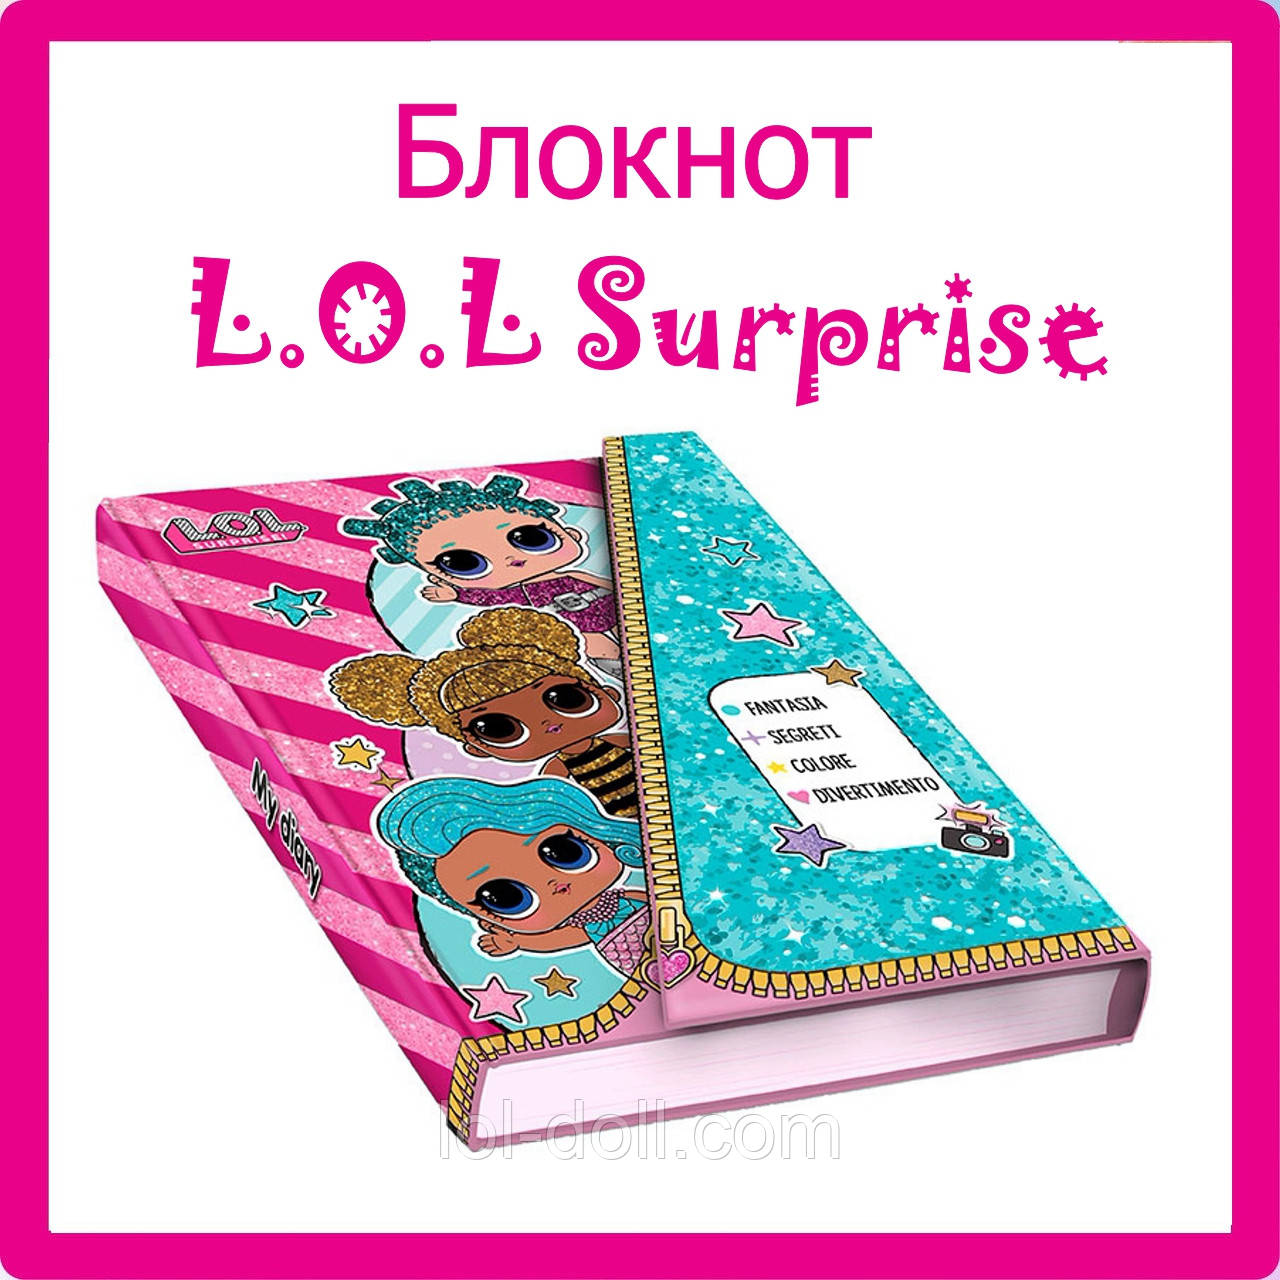 Блокнот L.O.L. Surprise! Мои Секреты Ежедневник LOL (наклейки) ЛОЛ Сюрприз Оригинал